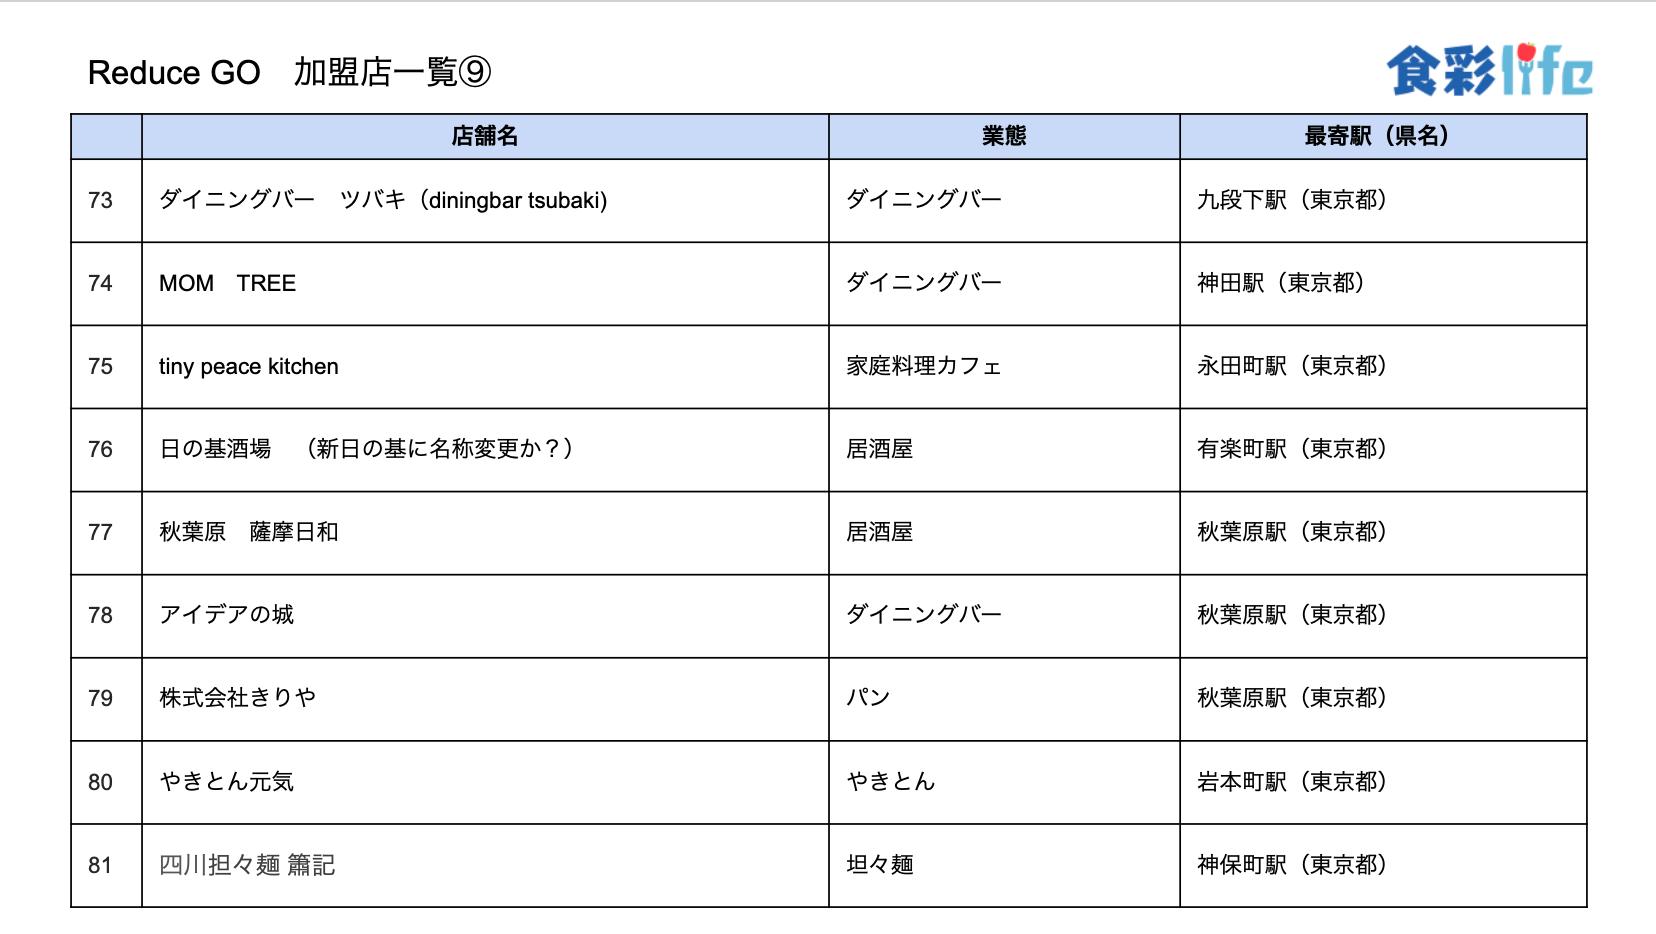 「ReduceGo」加盟店一覧9 (2020.3.18)